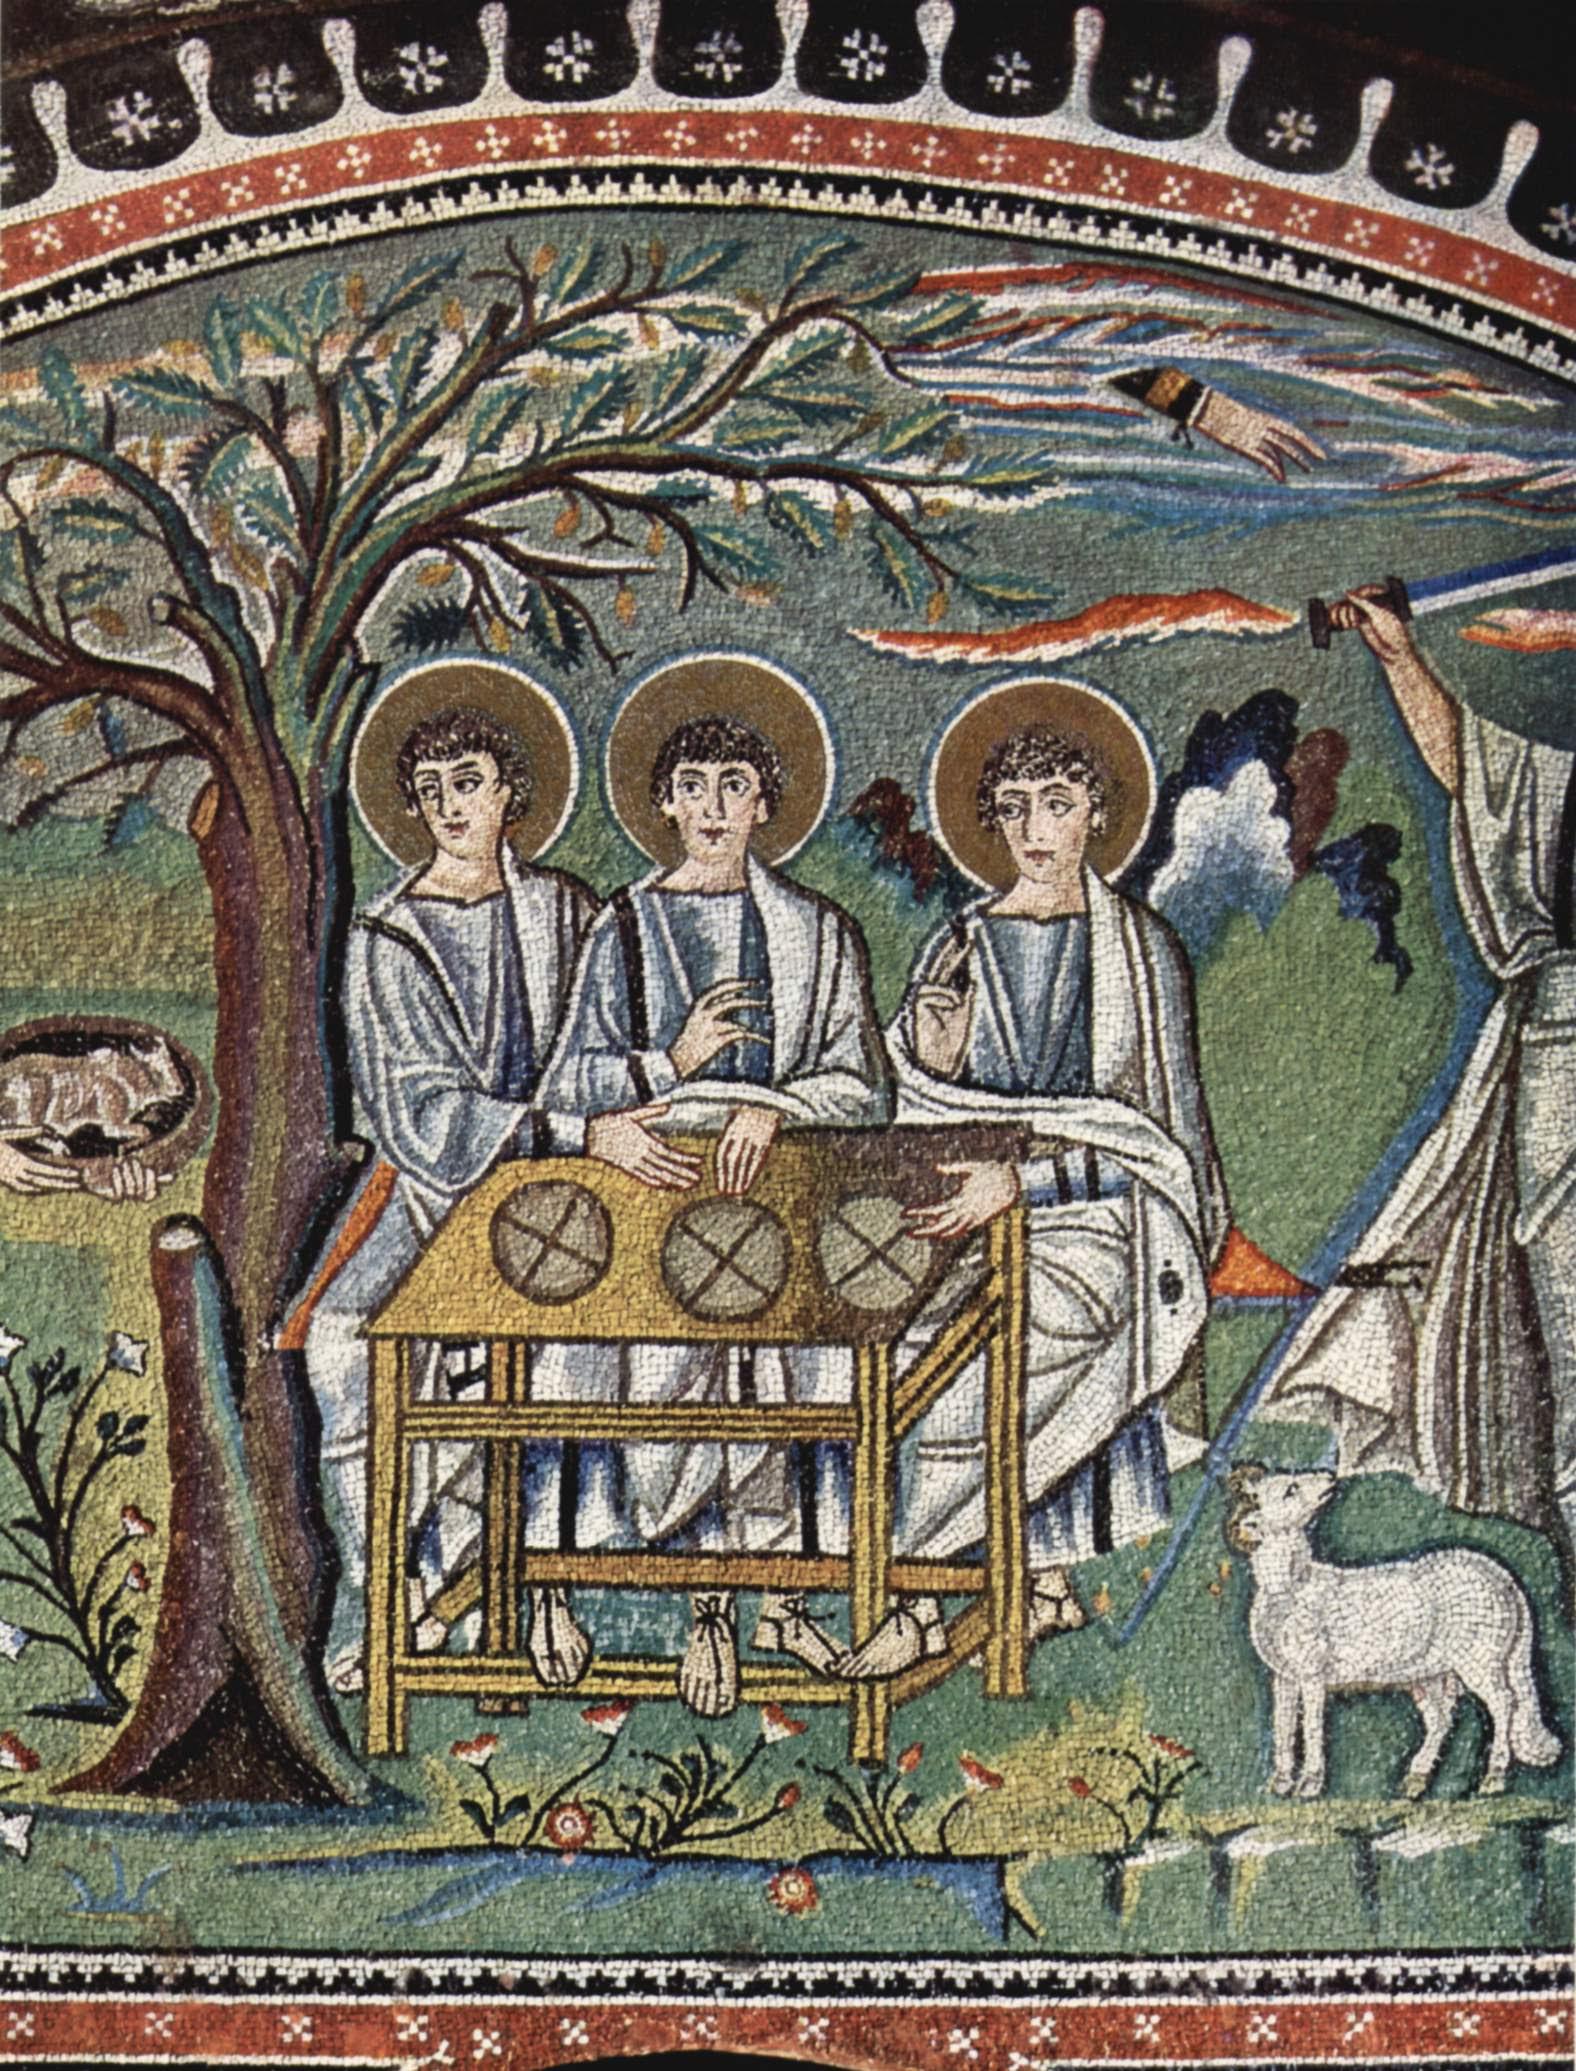 http://upload.wikimedia.org/wikipedia/commons/7/7c/Meister_von_San_Vitale_in_Ravenna_002.jpg